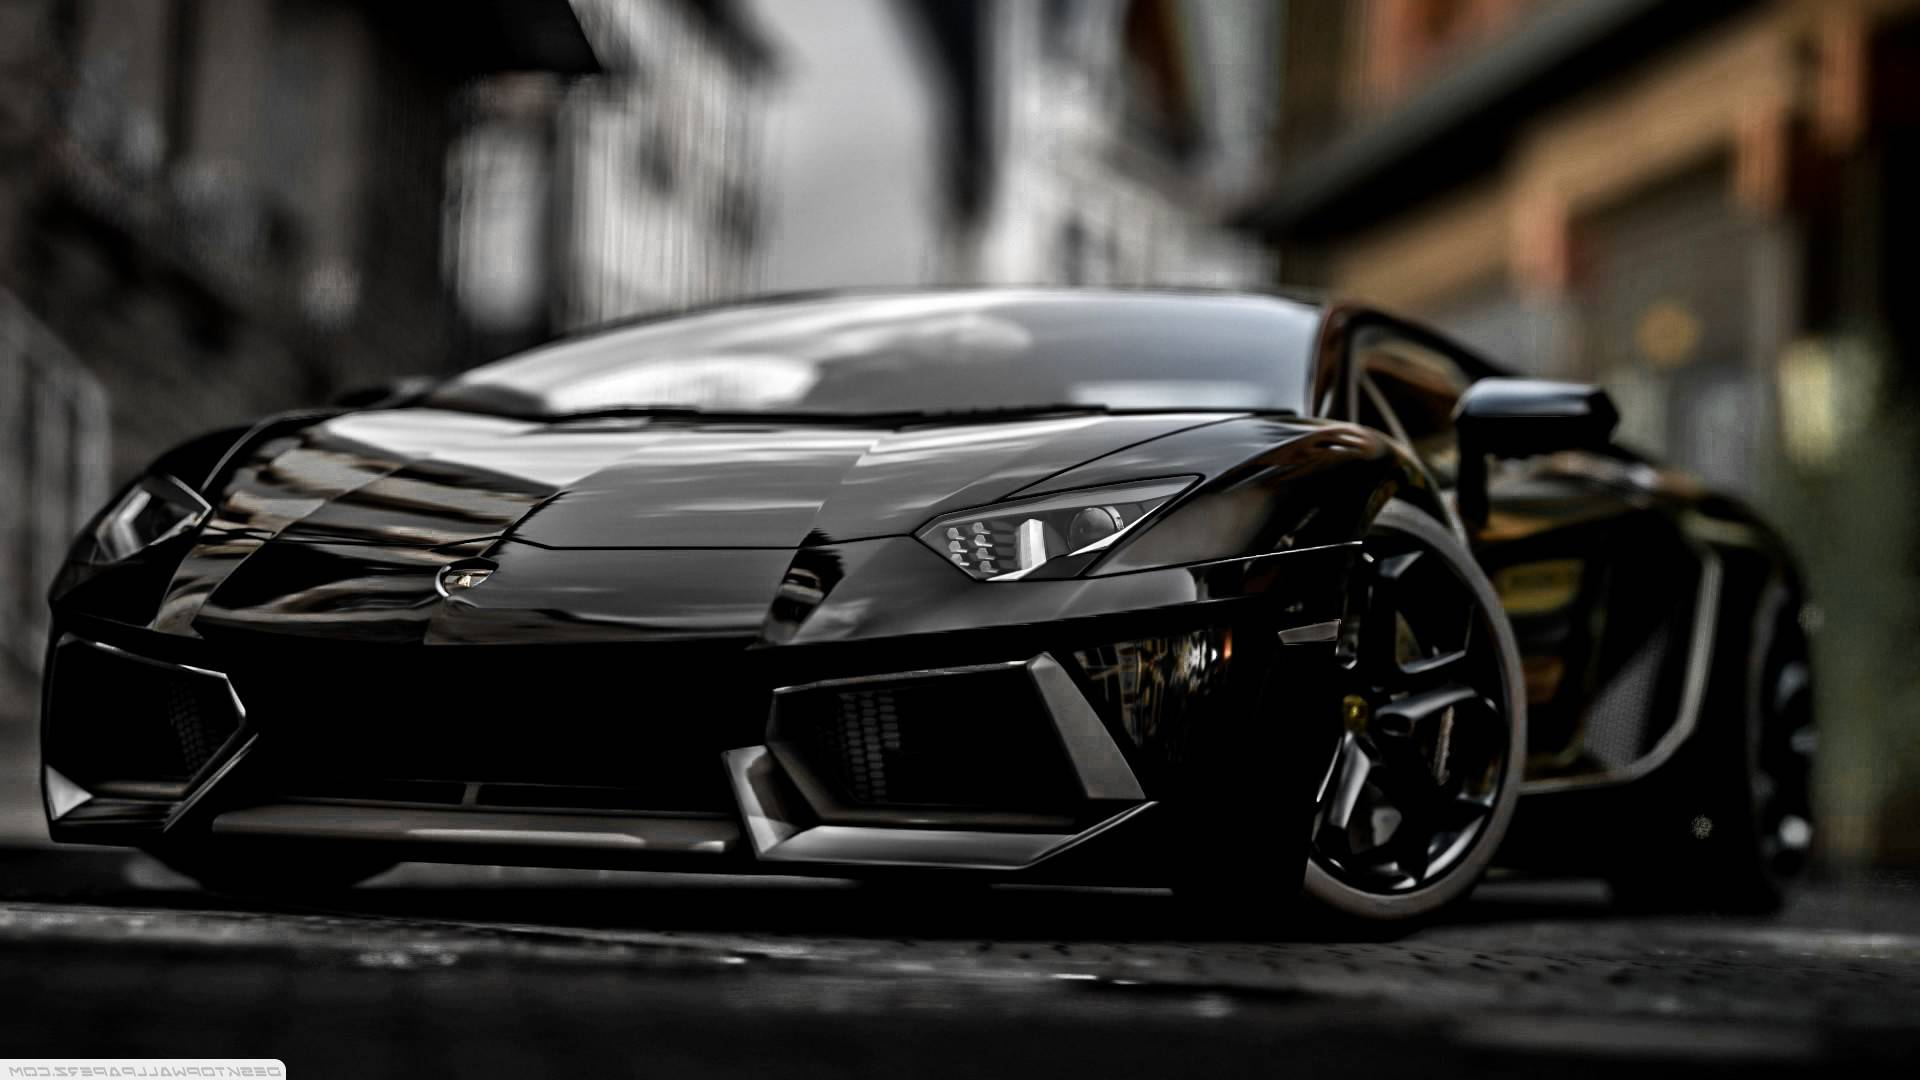 Lamborghini Veneno Wallpapers Wallpaper Cave